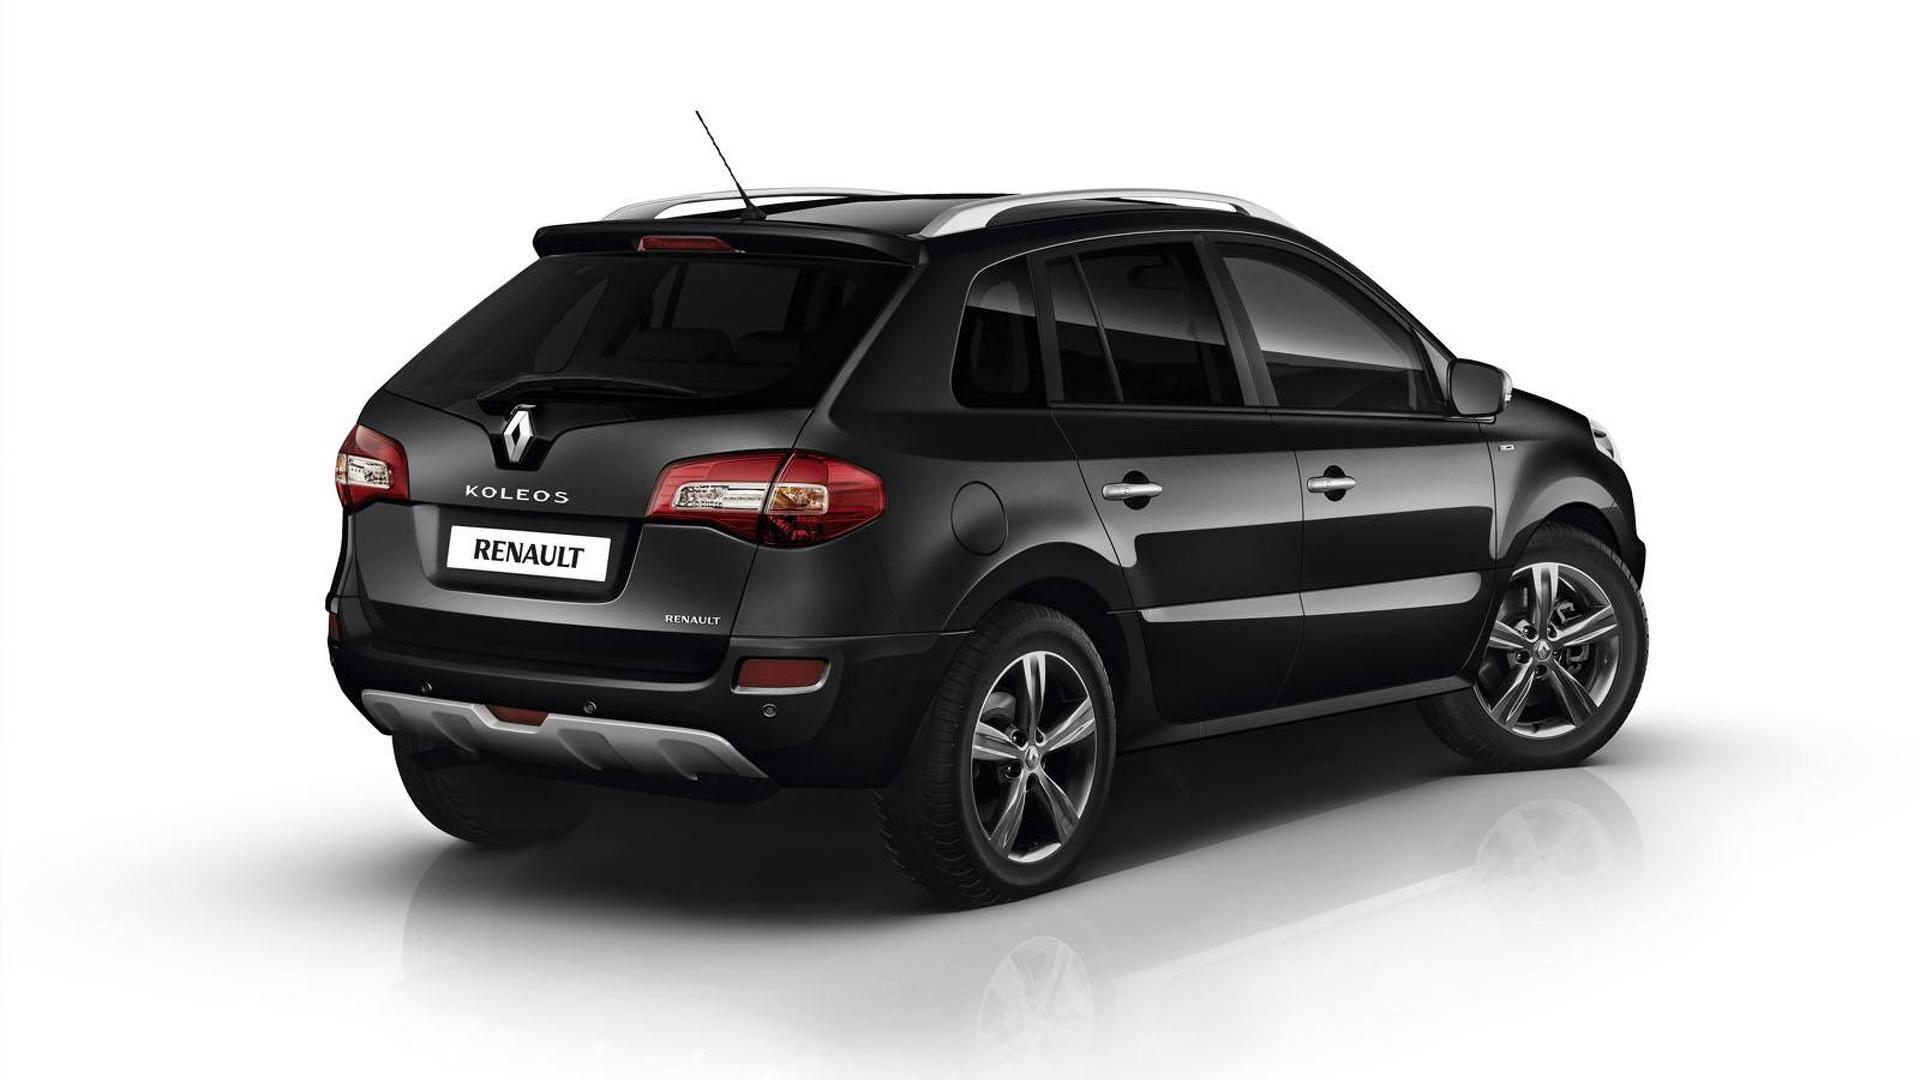 Renault Koleos Bose Edition unveiled